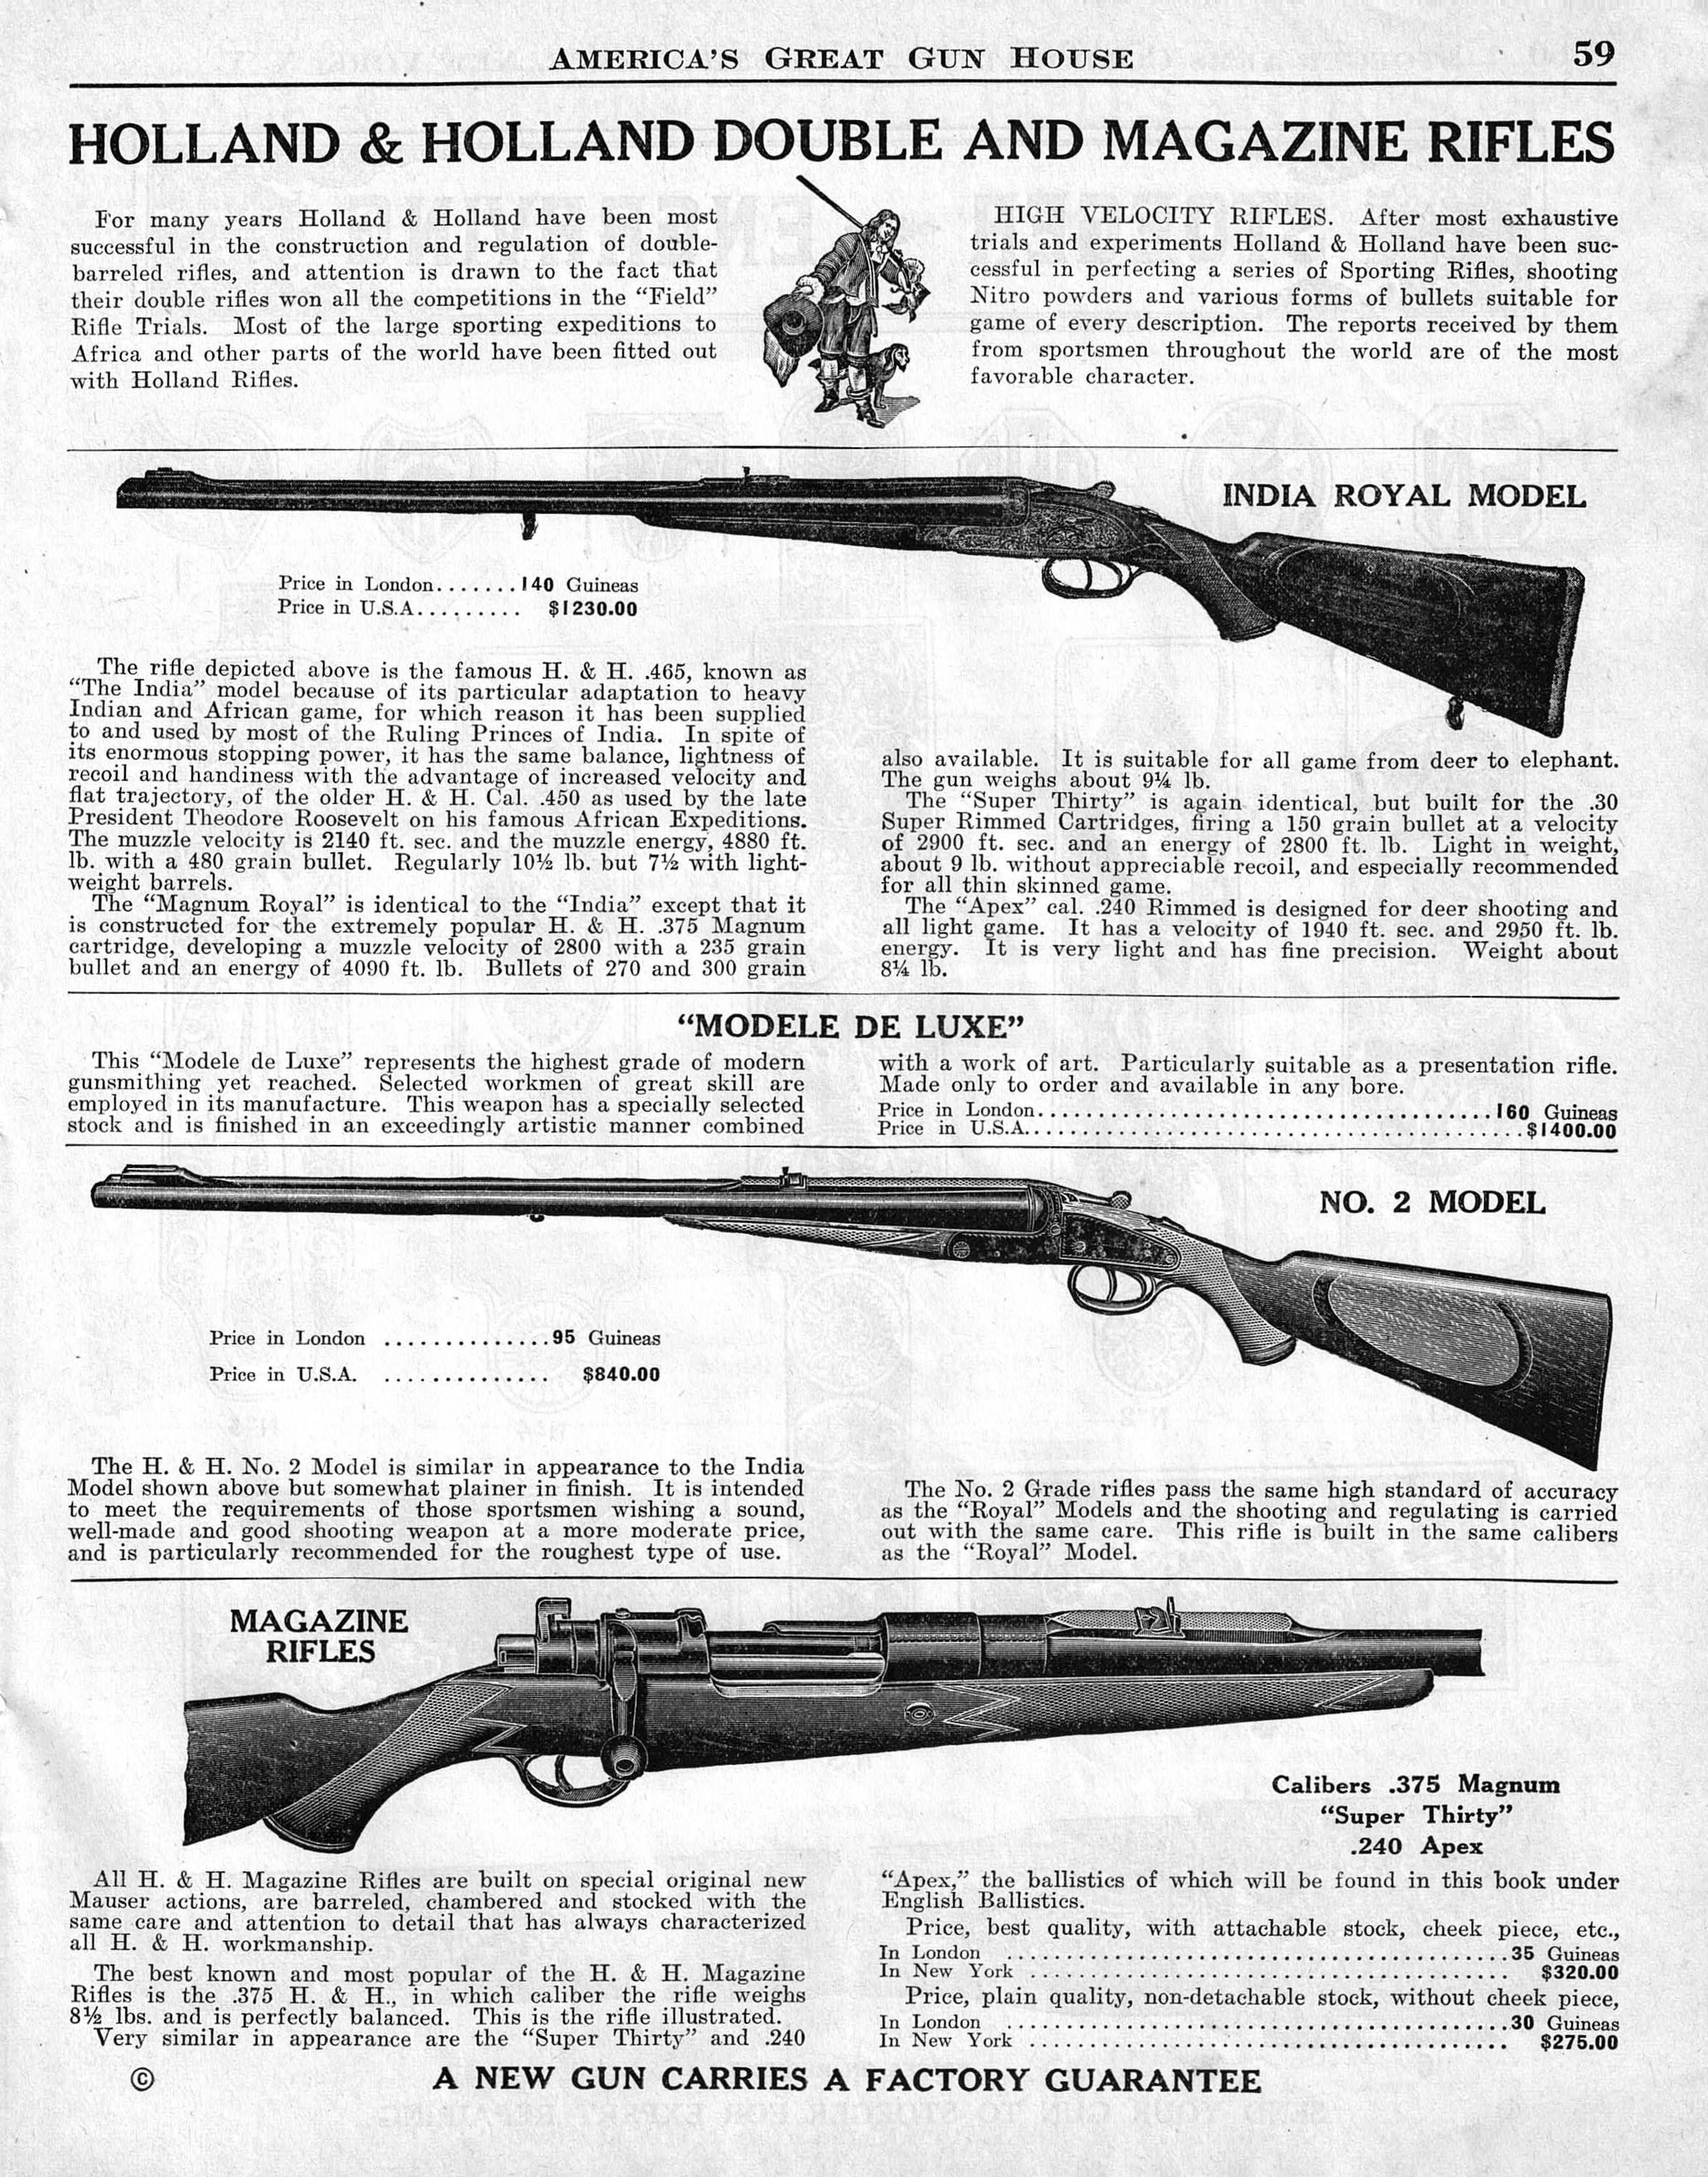 Holland & Holland Magazine Rifles ST39 Page 59 001 (2).jpg